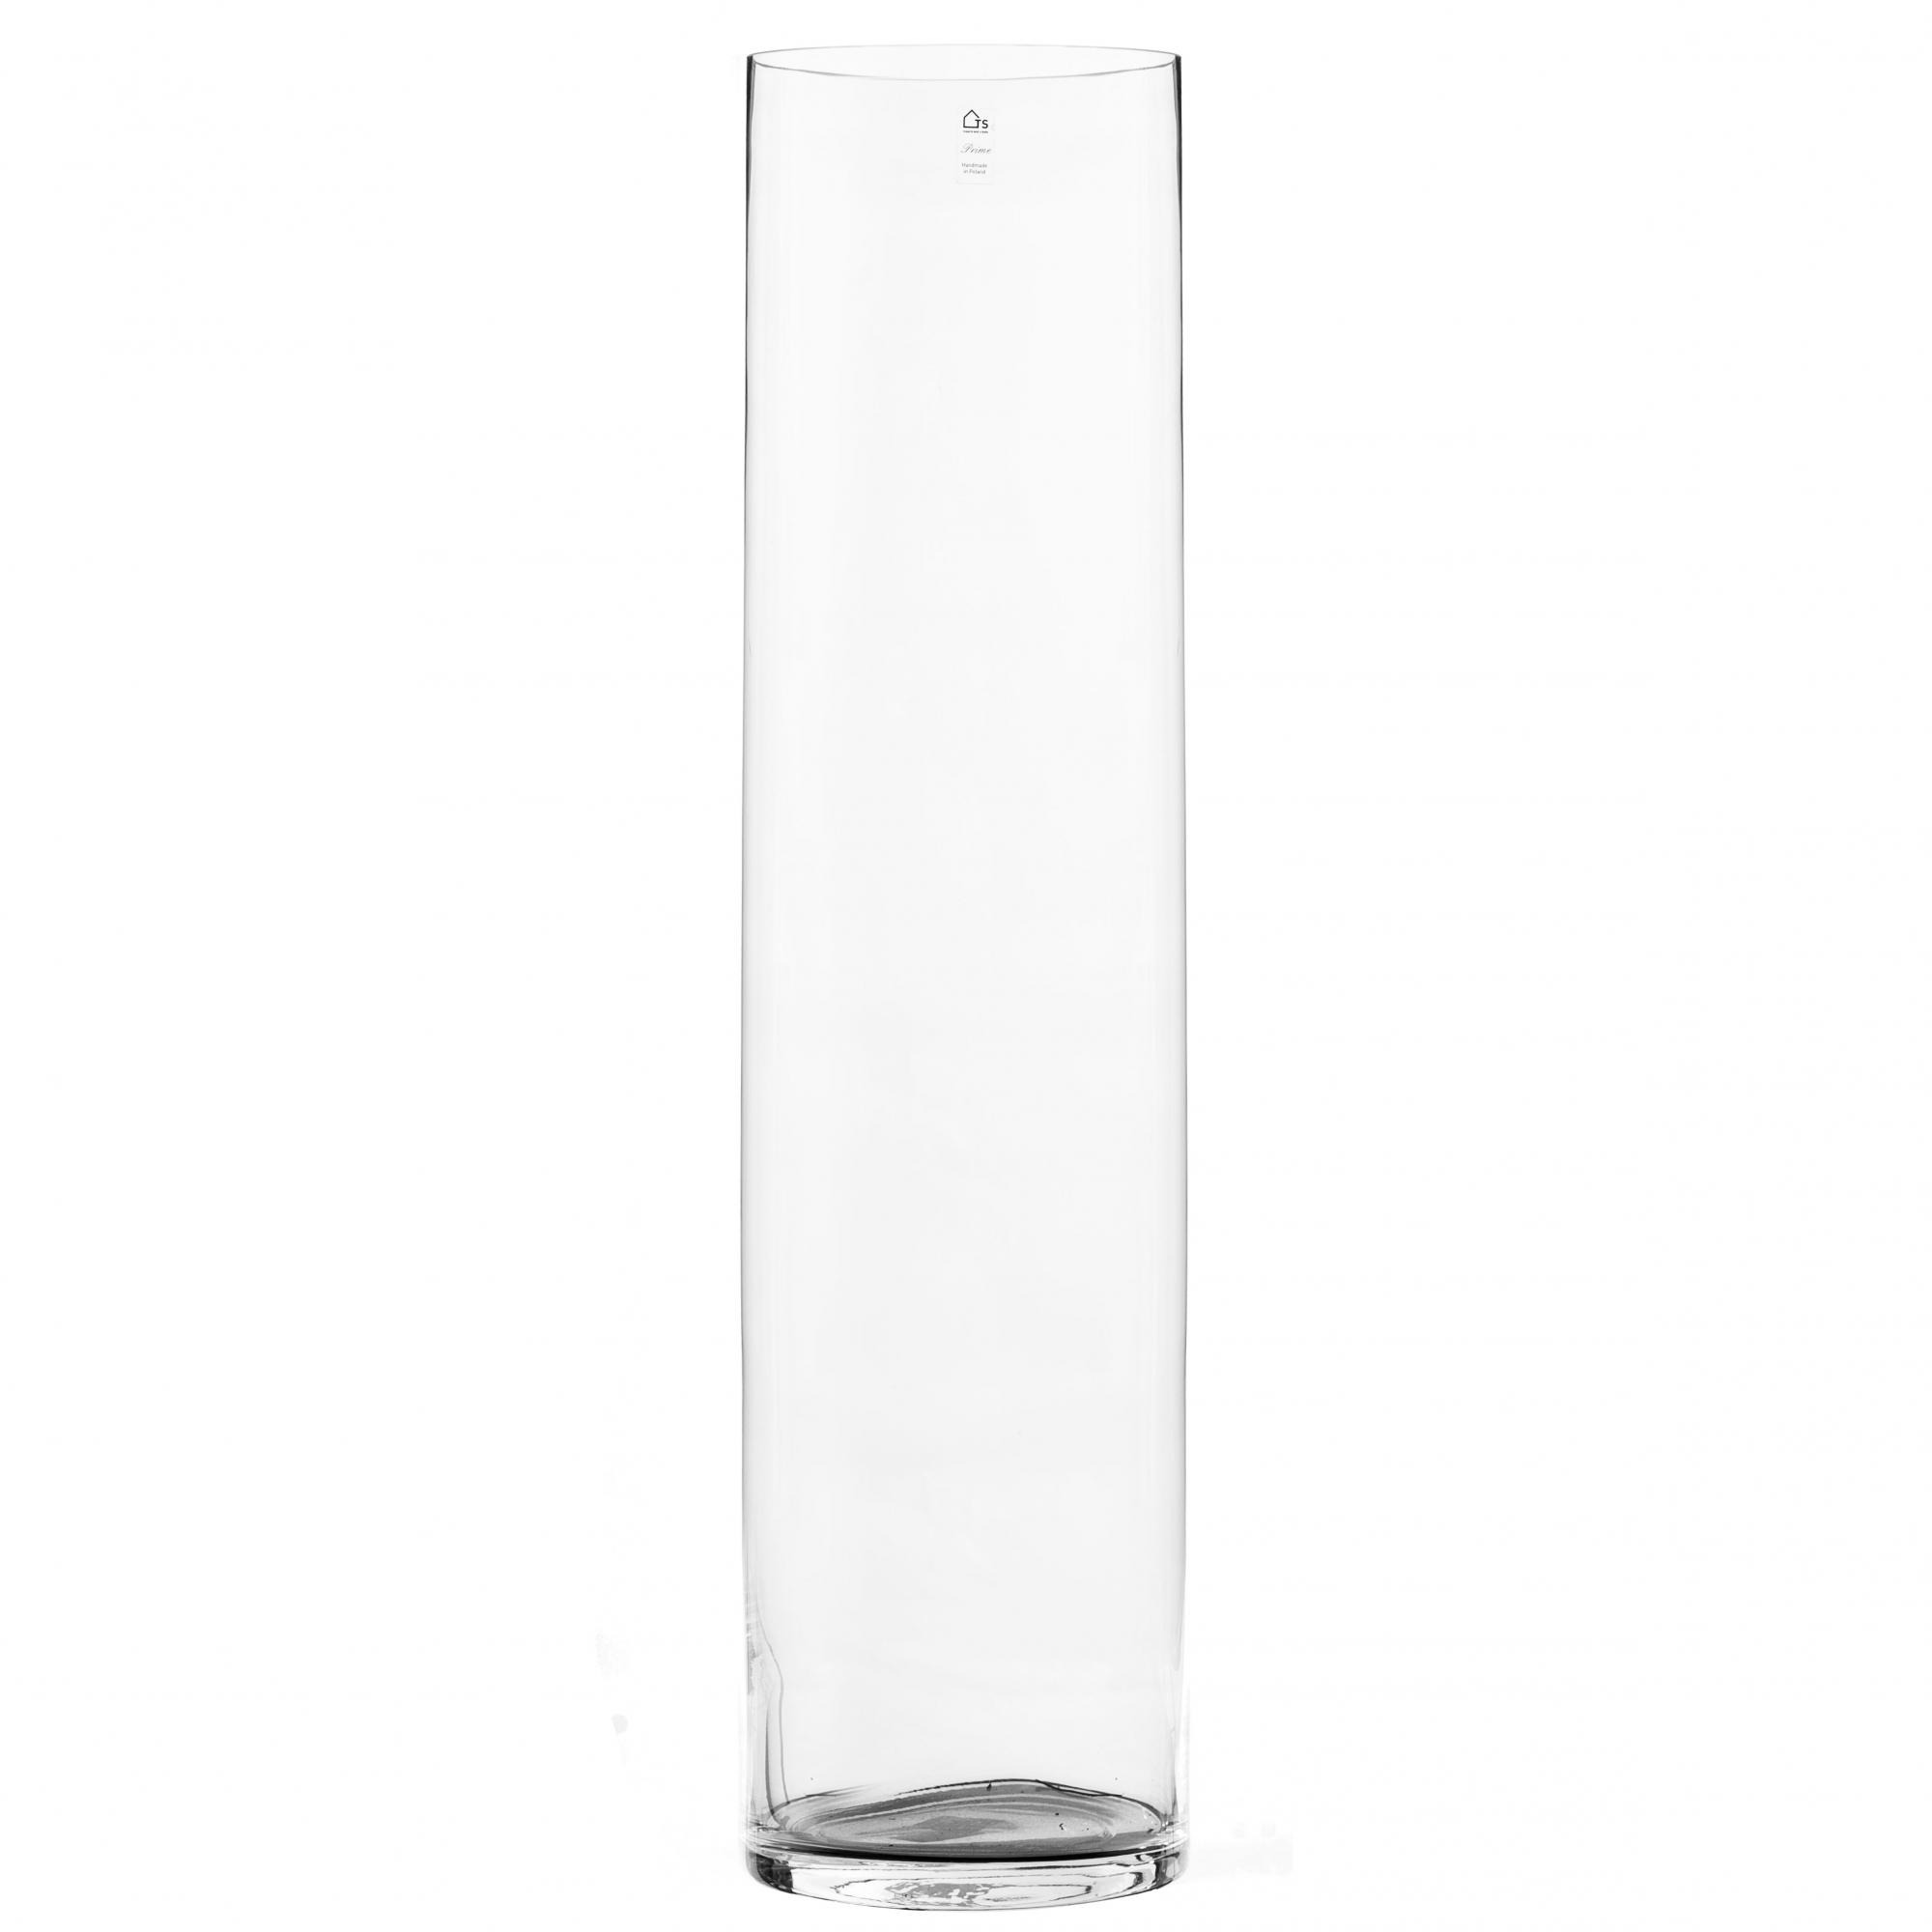 Vaso Cilindro de Vidro Artesanal Polonês 20x100cm